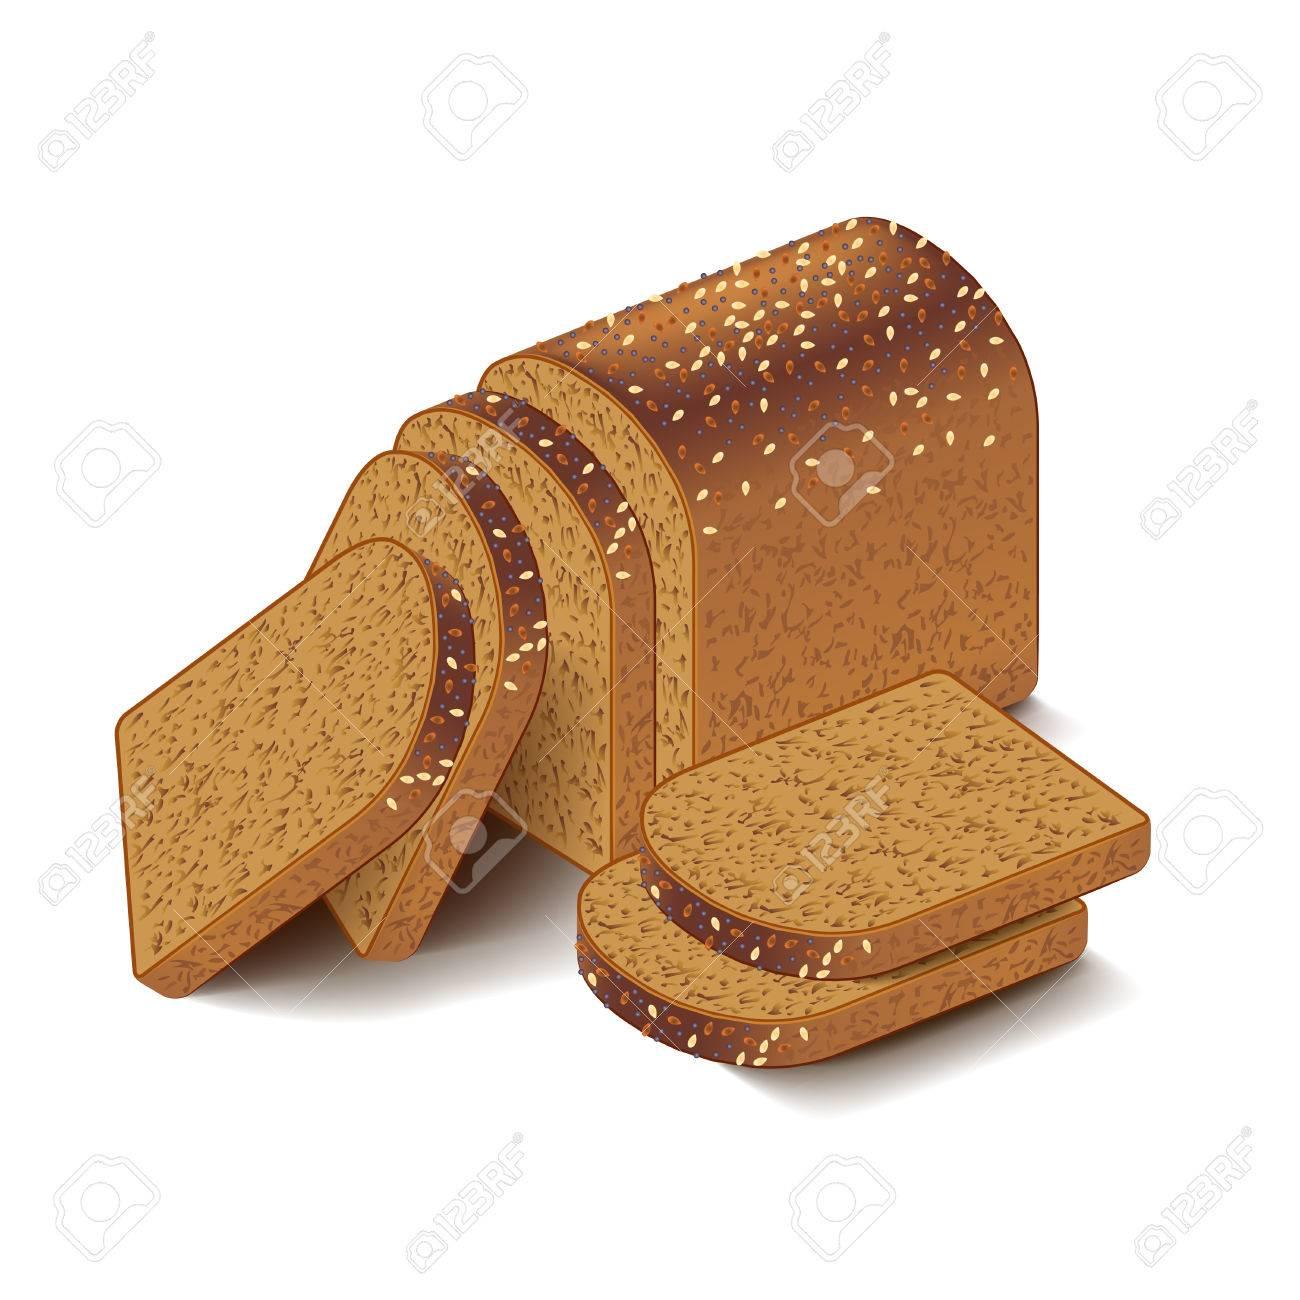 Whole grain sliced isolated. Grains clipart bread